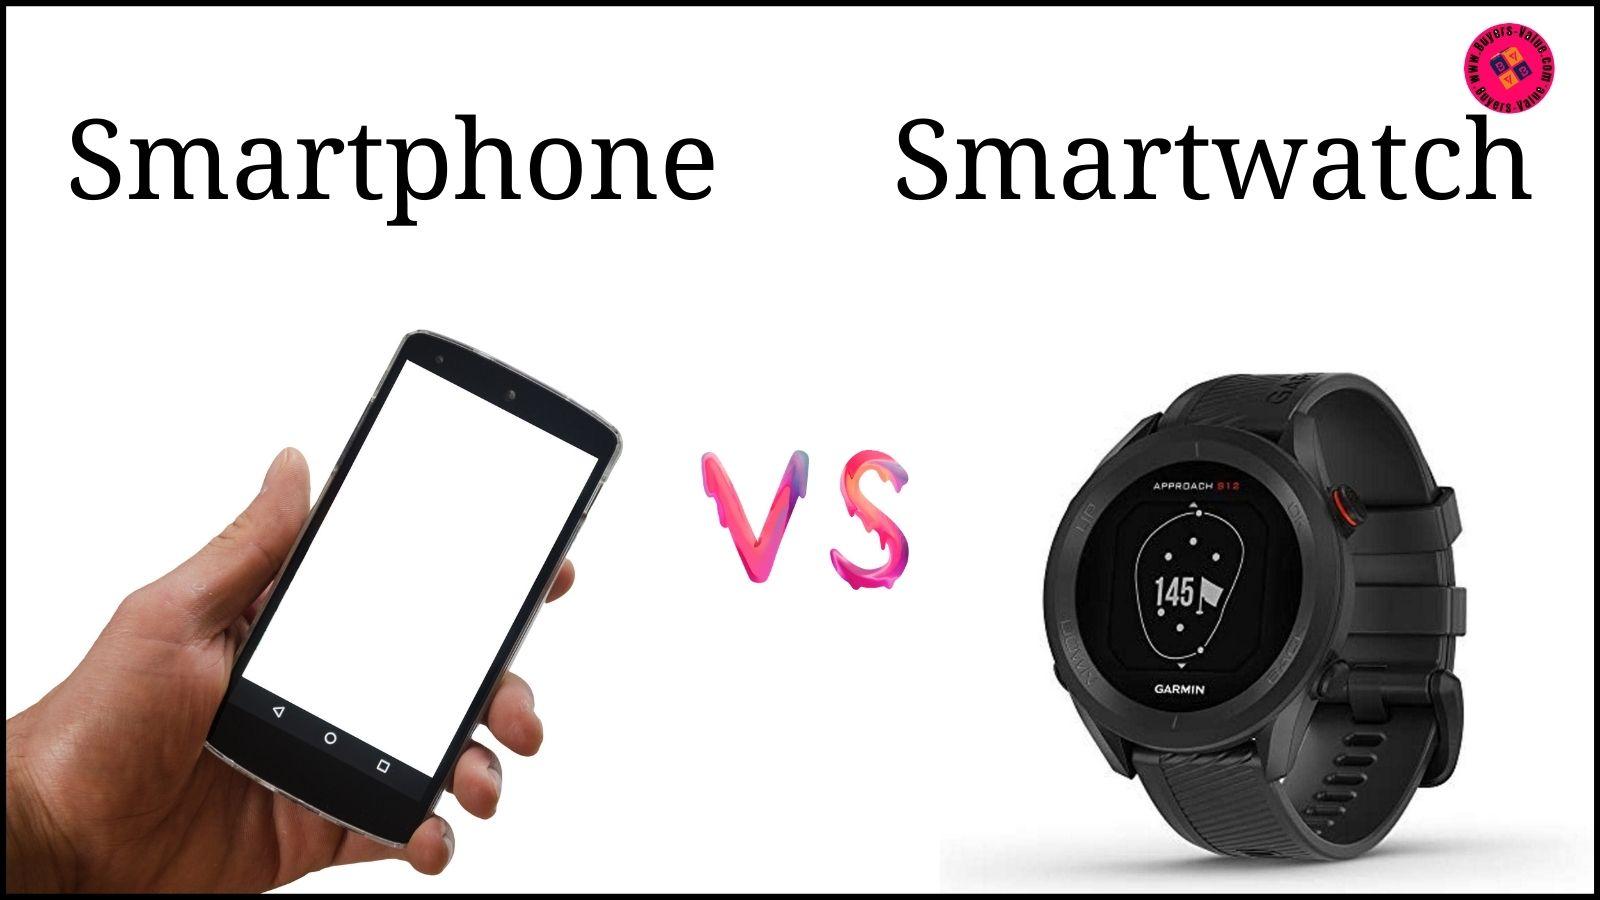 smartwatch vs smartphone